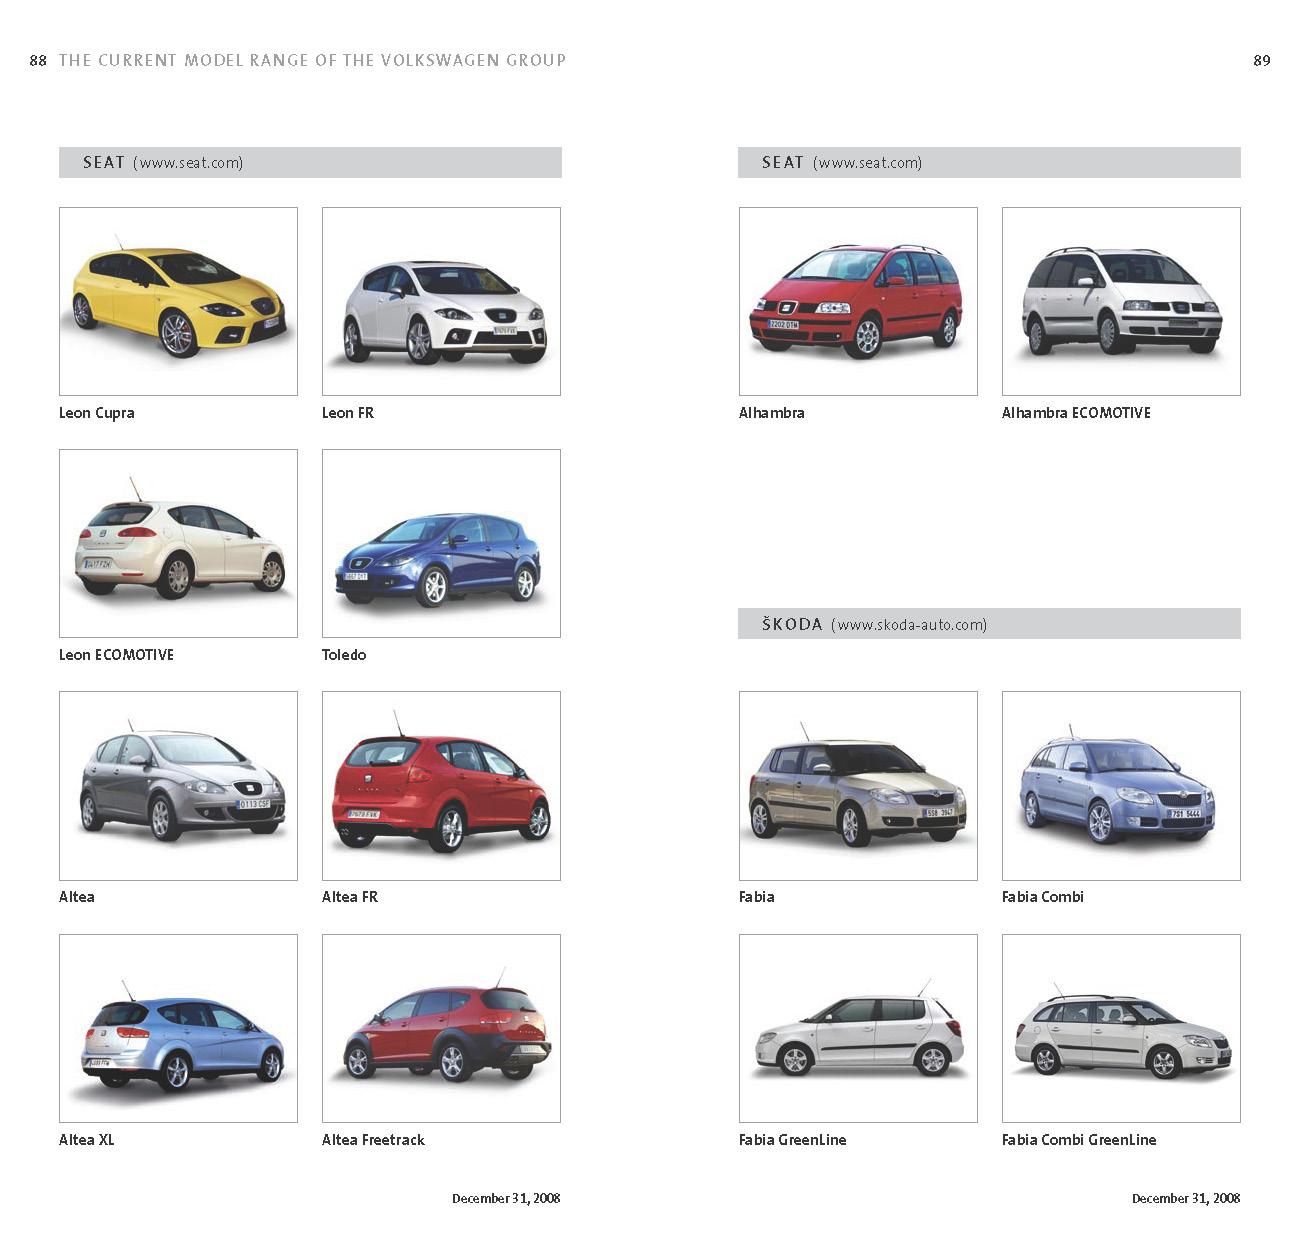 sport cars  complete list  vw groups  models sold worldwide